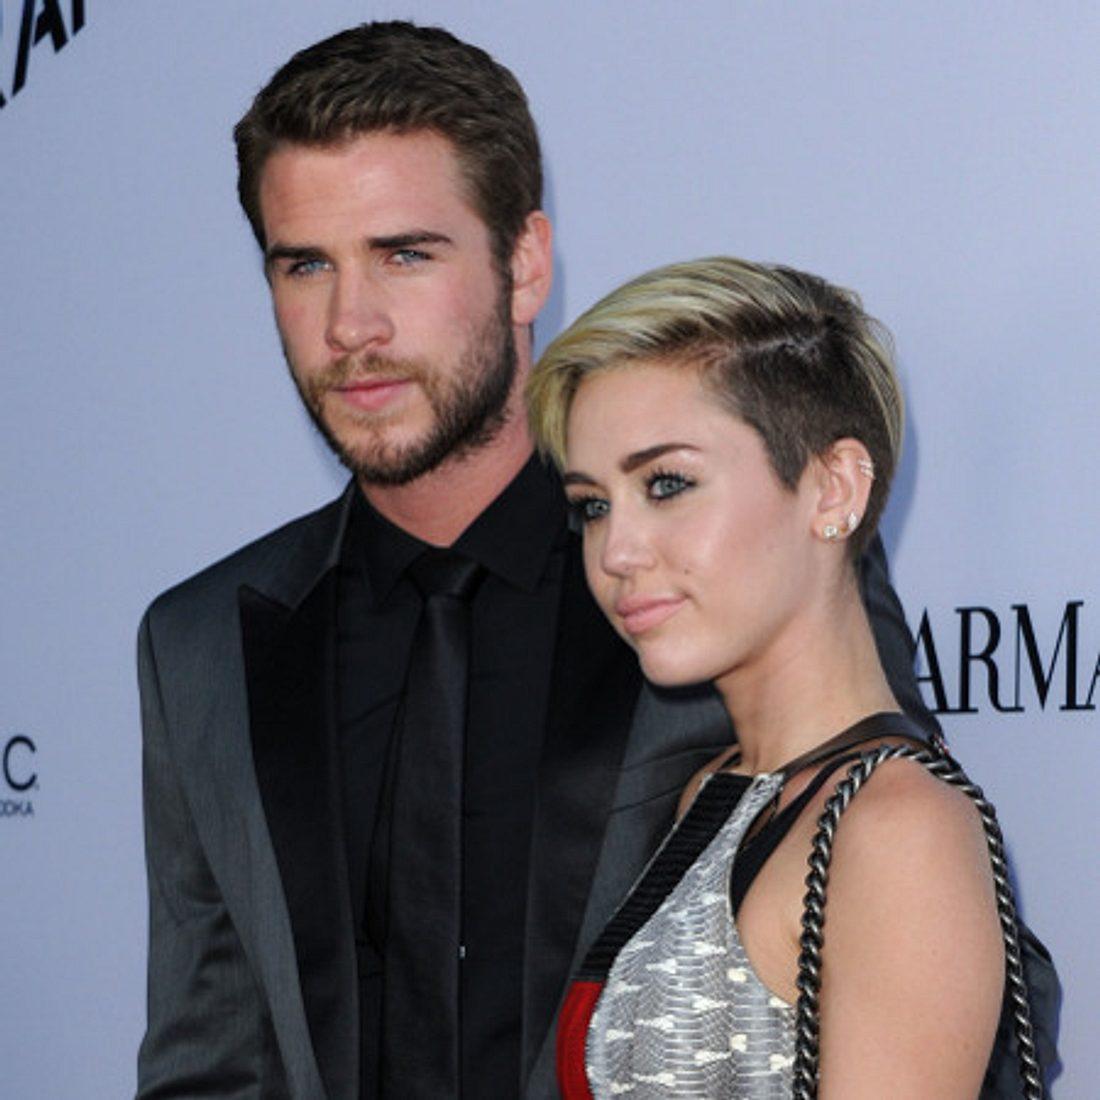 Miley Cyrus: War Liam Hemsworth untreu?